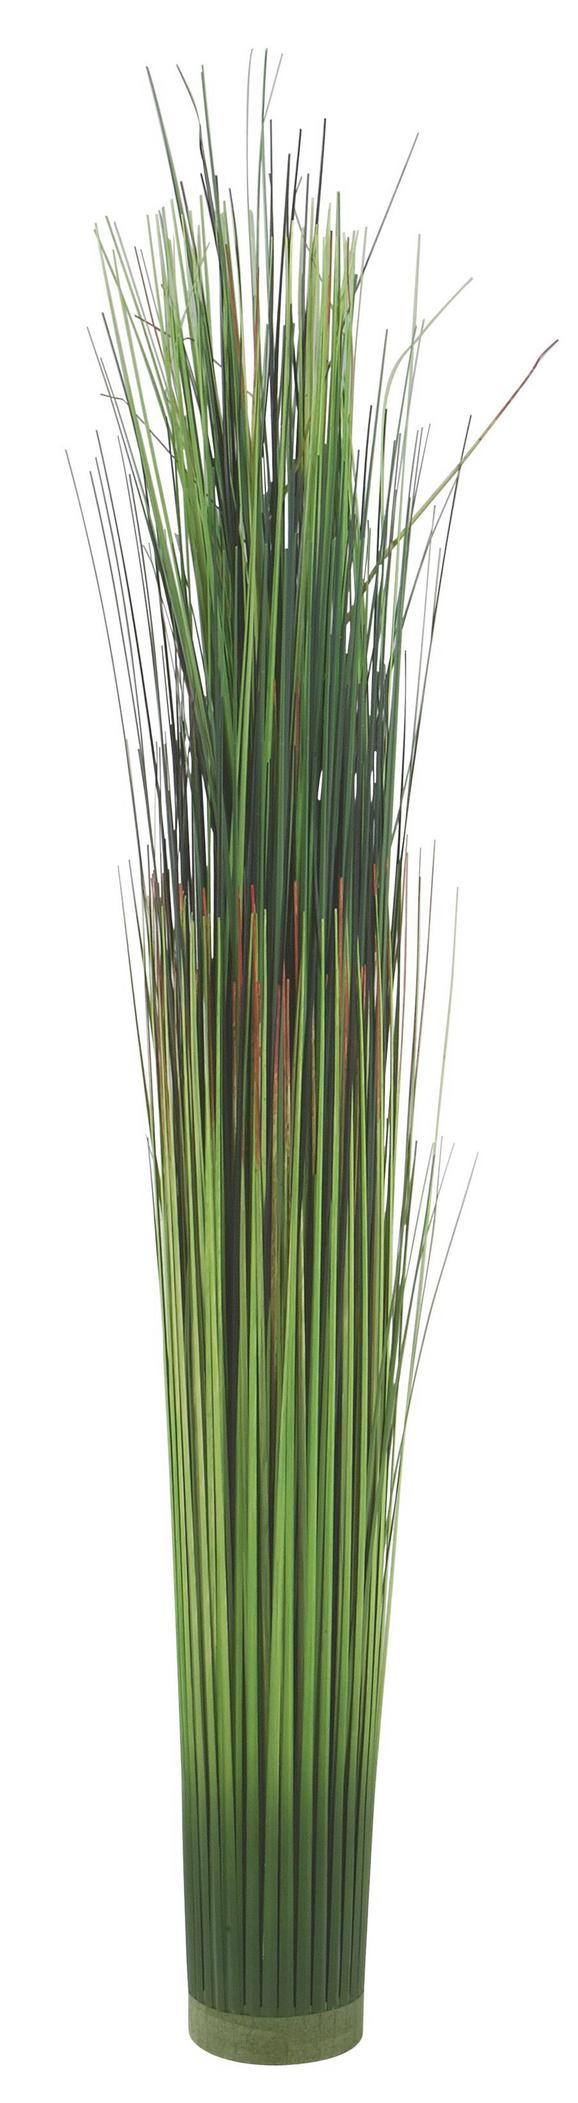 Grasbündel Markus Grün - Grün, Kunststoff (75cm)